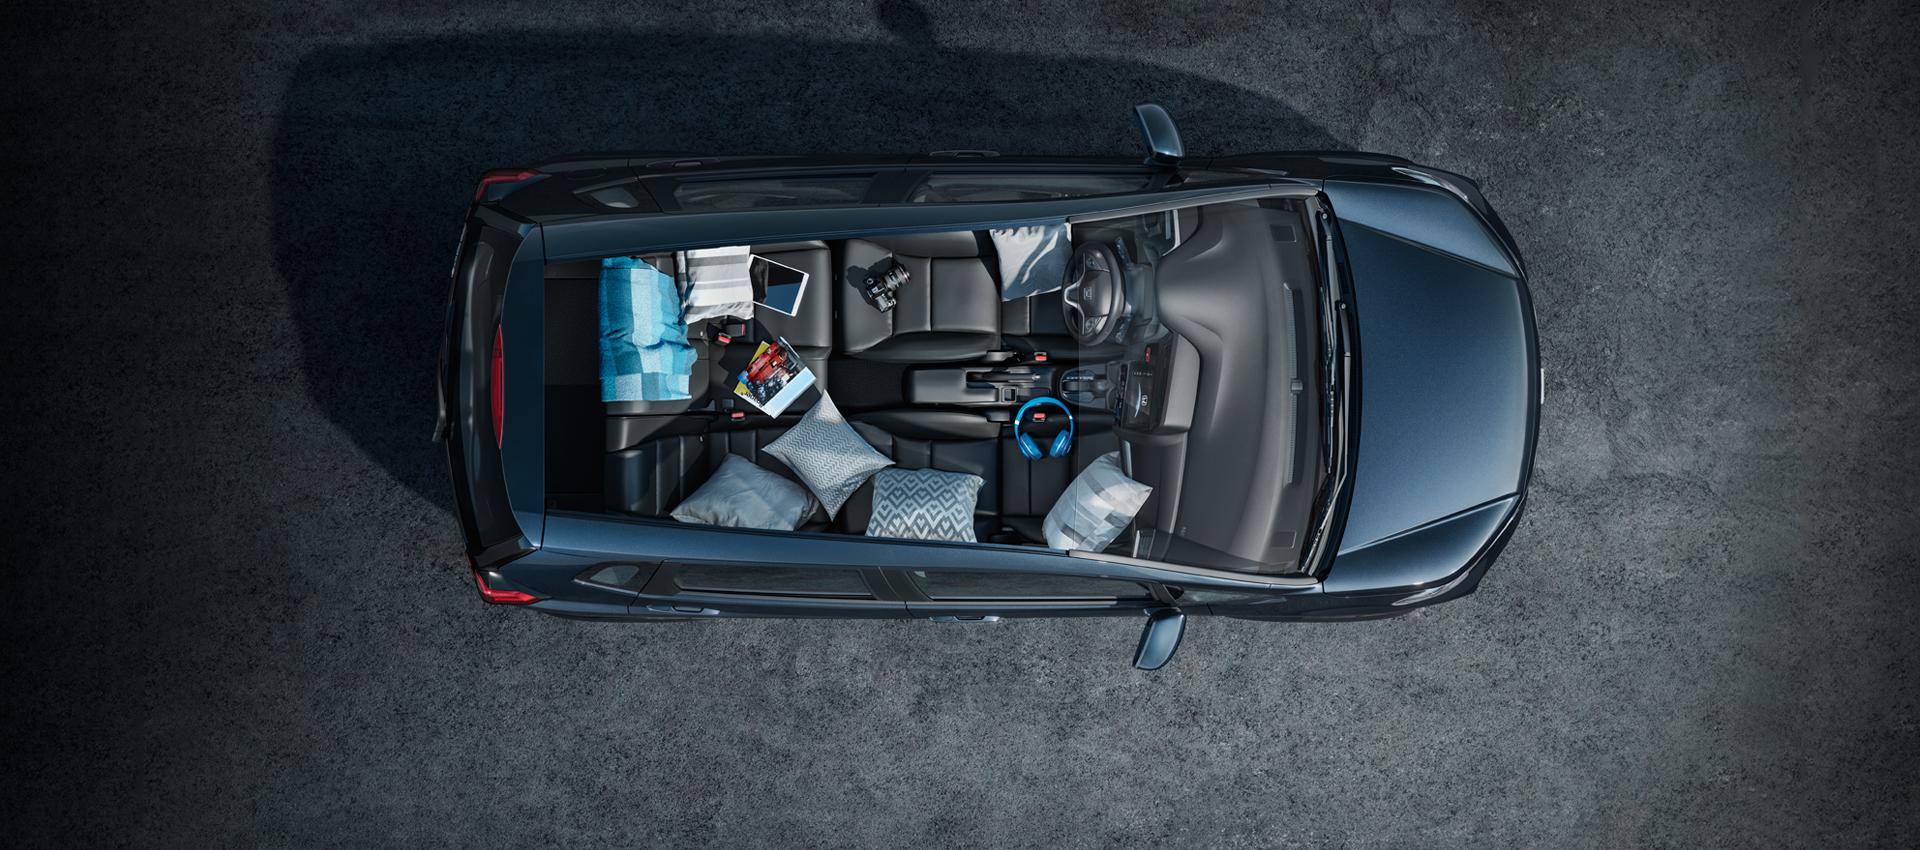 Honda WR-V 2021 - Magic Seat - Modo Refresh